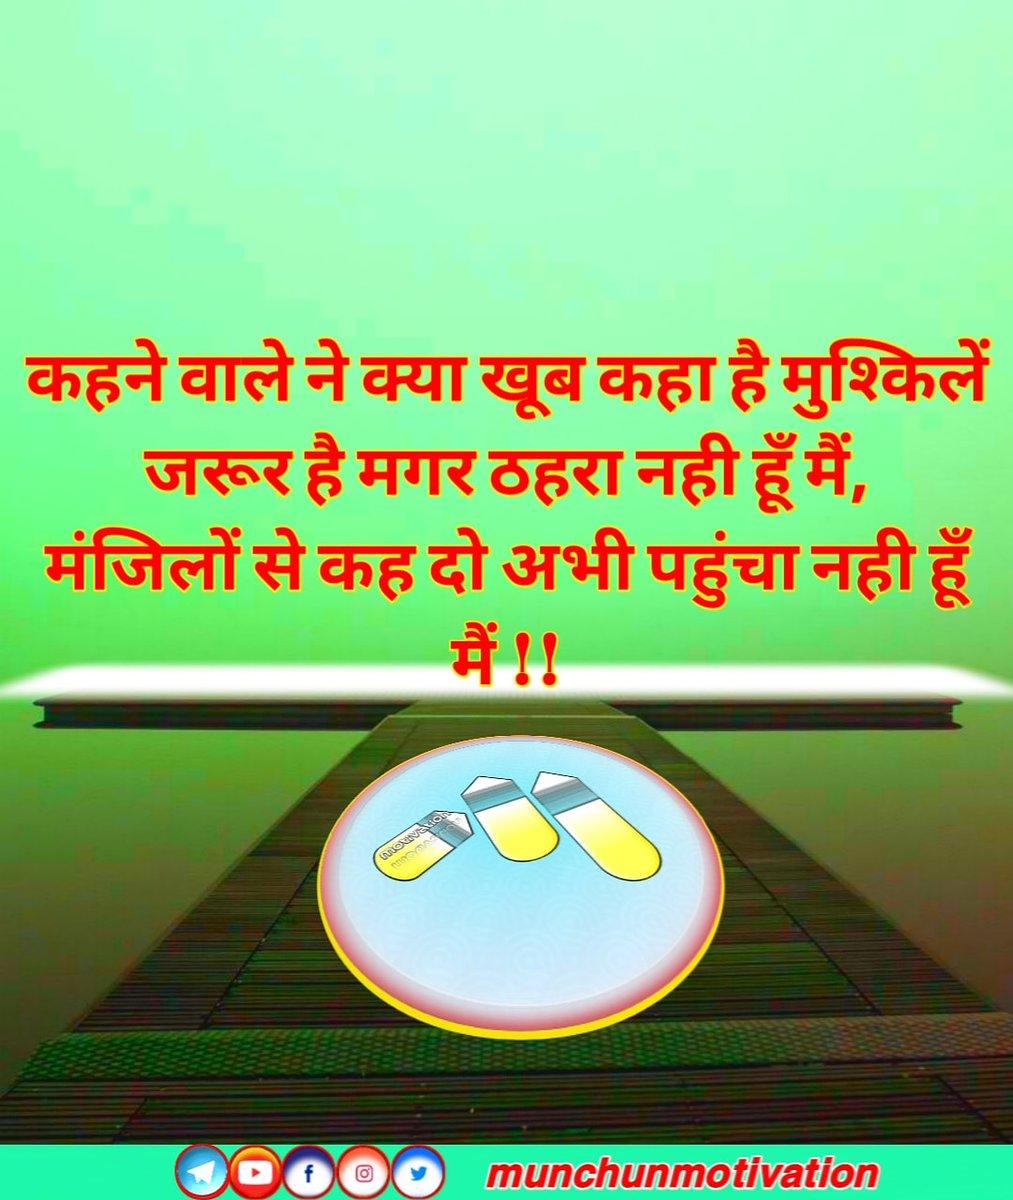 Motivation Quotes. #goodmorning #goodmorningpost #motivationquote #motivation #munchunmotivate #bestquotes #bestmotivation #suvichar #lifelesson #life #sikh #bestmotivationalquotes #motivationalquotes #indianmotivation #hindimotivationalquotes #hindimotivationpic.twitter.com/EHlUchDhD3